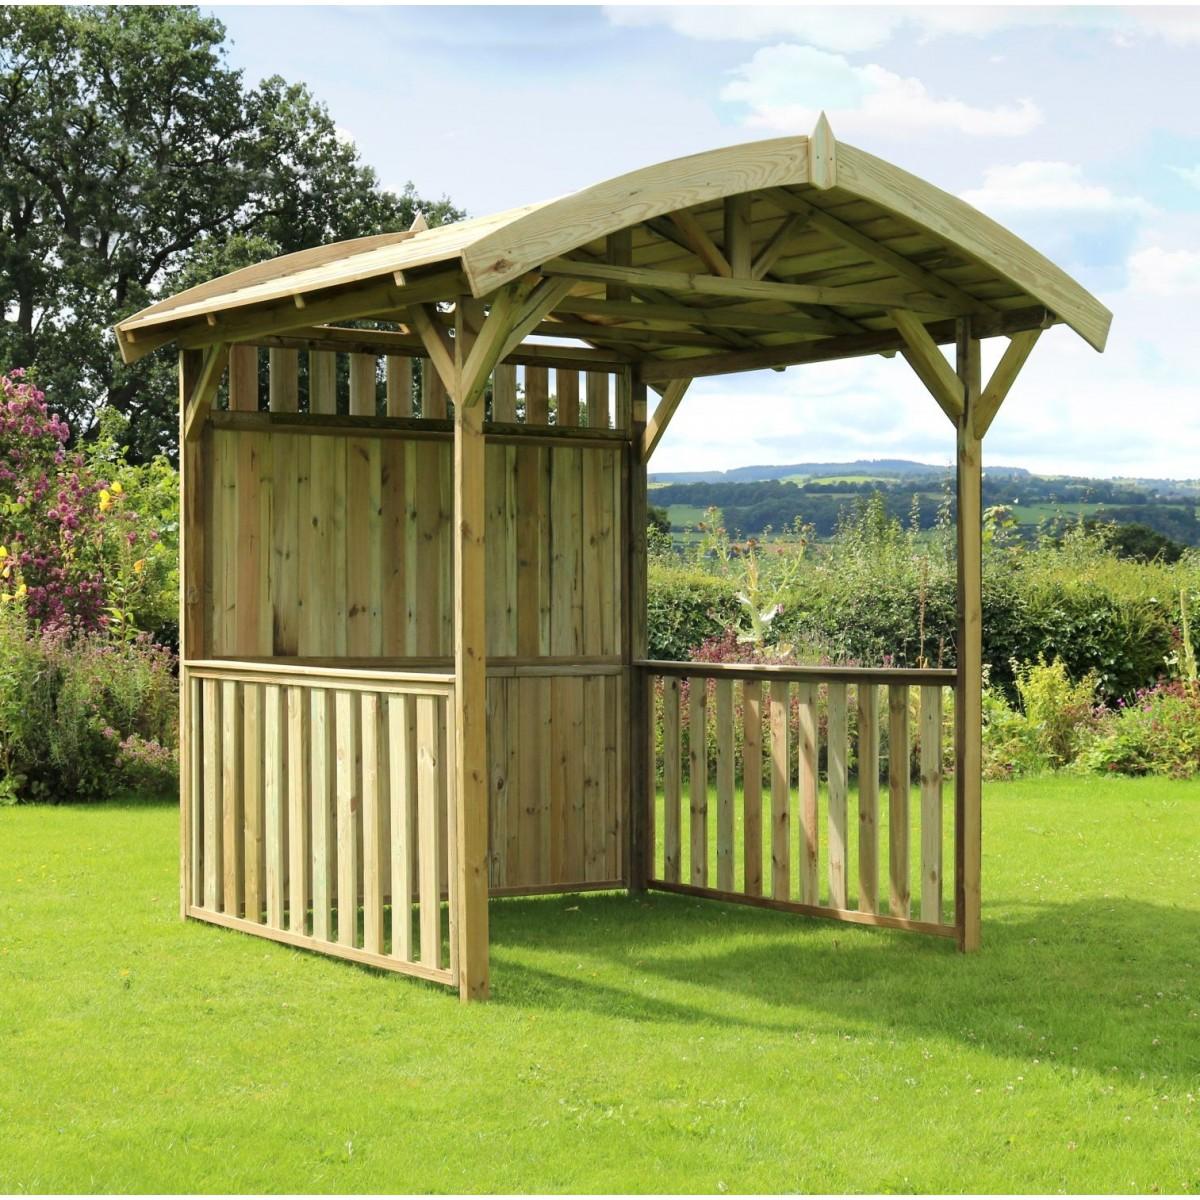 Ferrol Garden Gazebo Pressure treated Wood Shelter